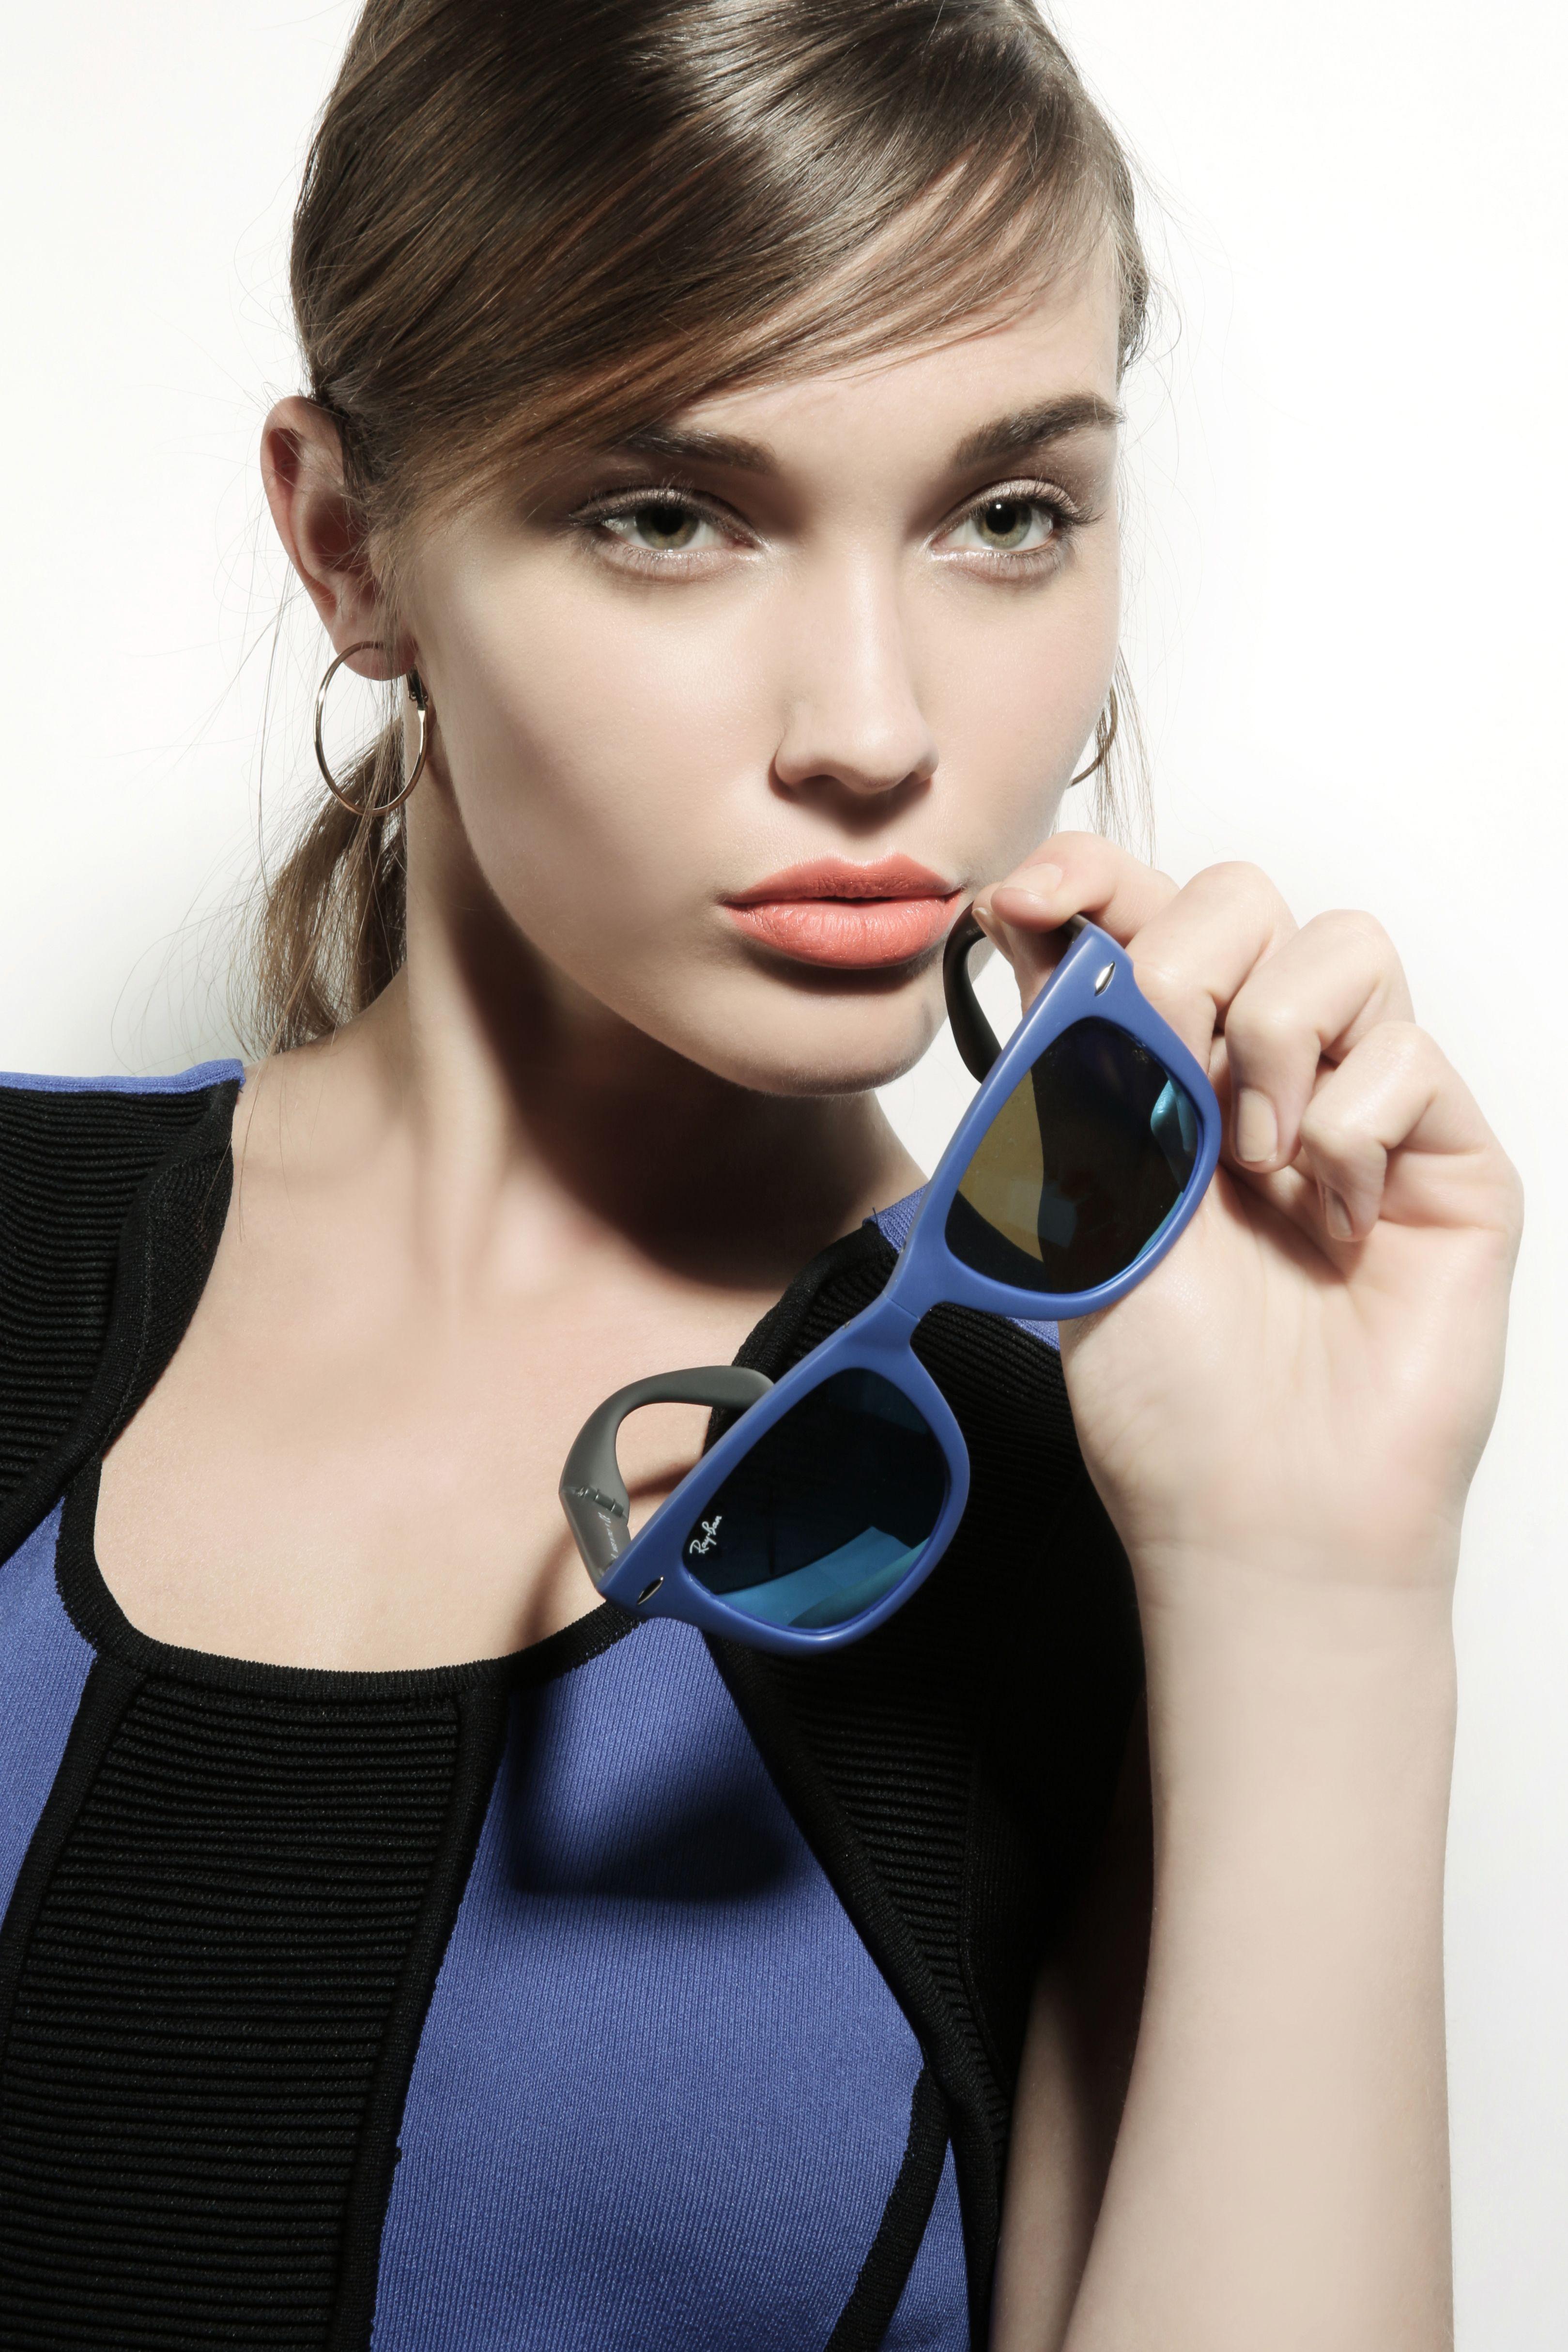 Boyner Sunglasses Trend Yaz Sun Cool Gozluk Fashion Moda Style Attractive Elegant Gunes Summer Summer2014 Moda Gozluk Trendler